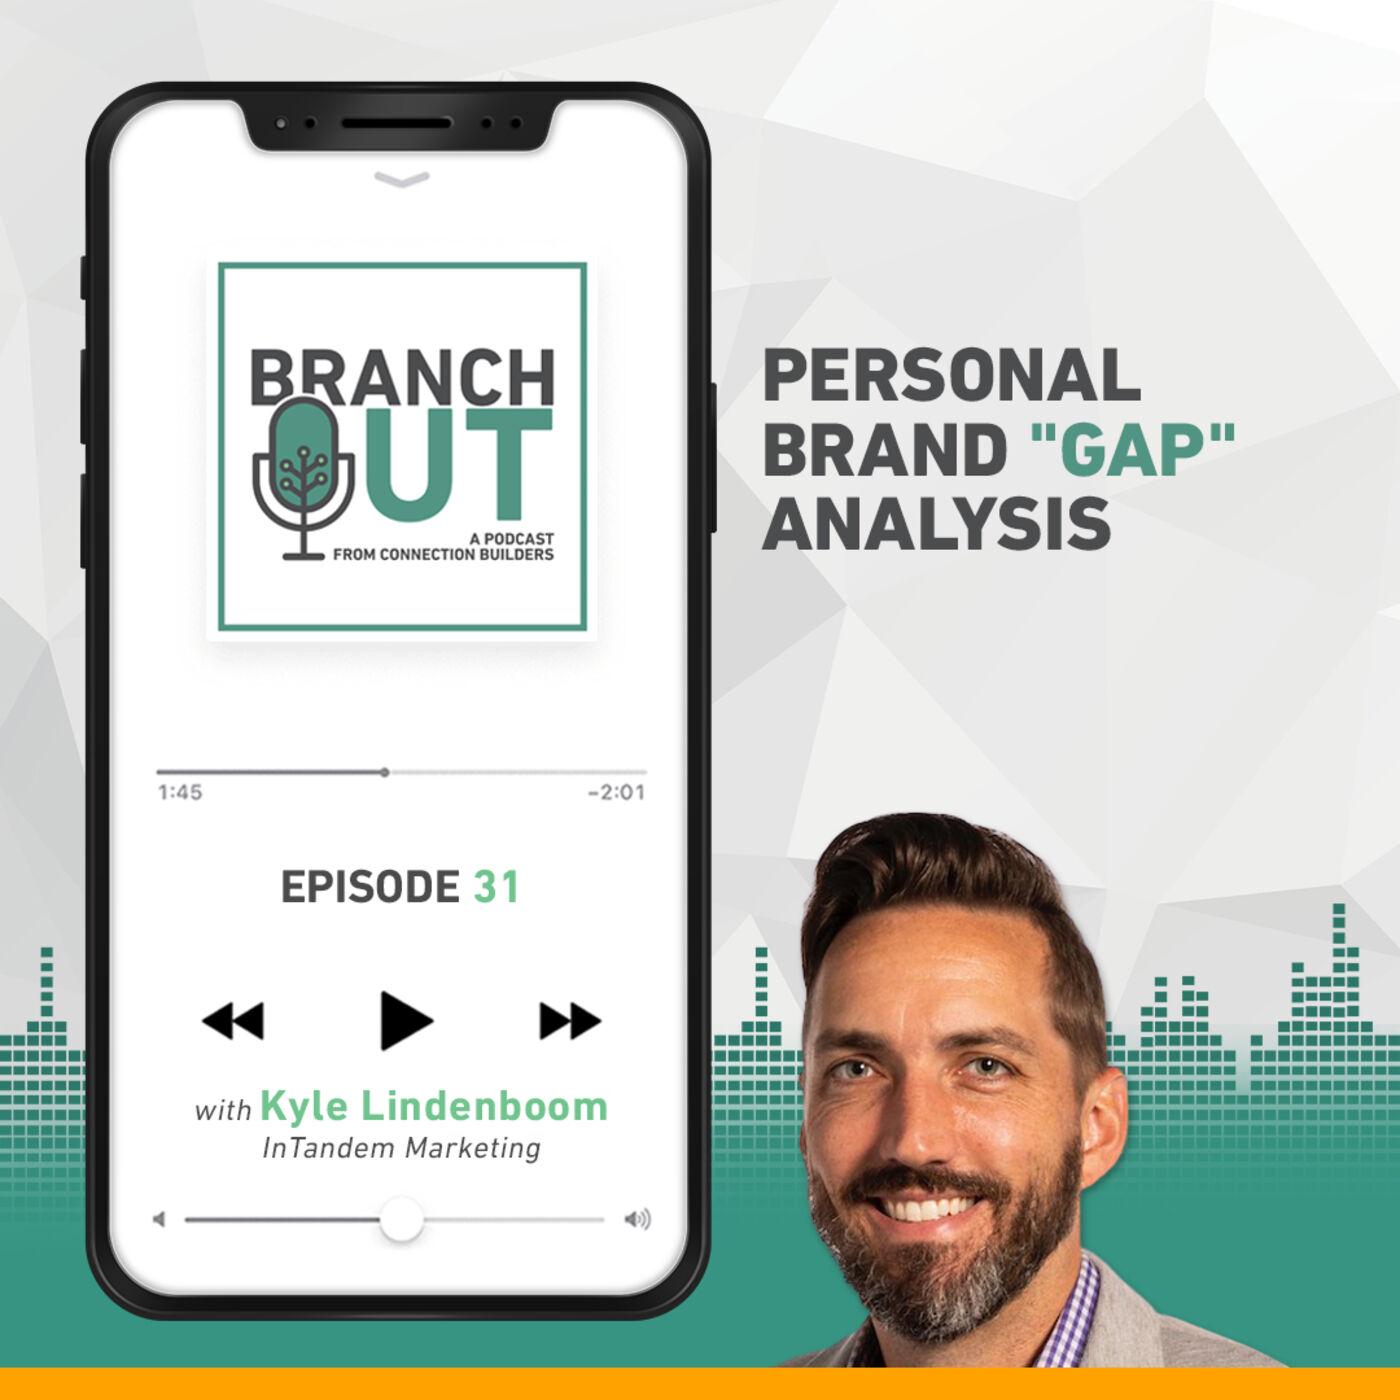 Your Personal Brand Gap Analysis - Kyle Lindenboom